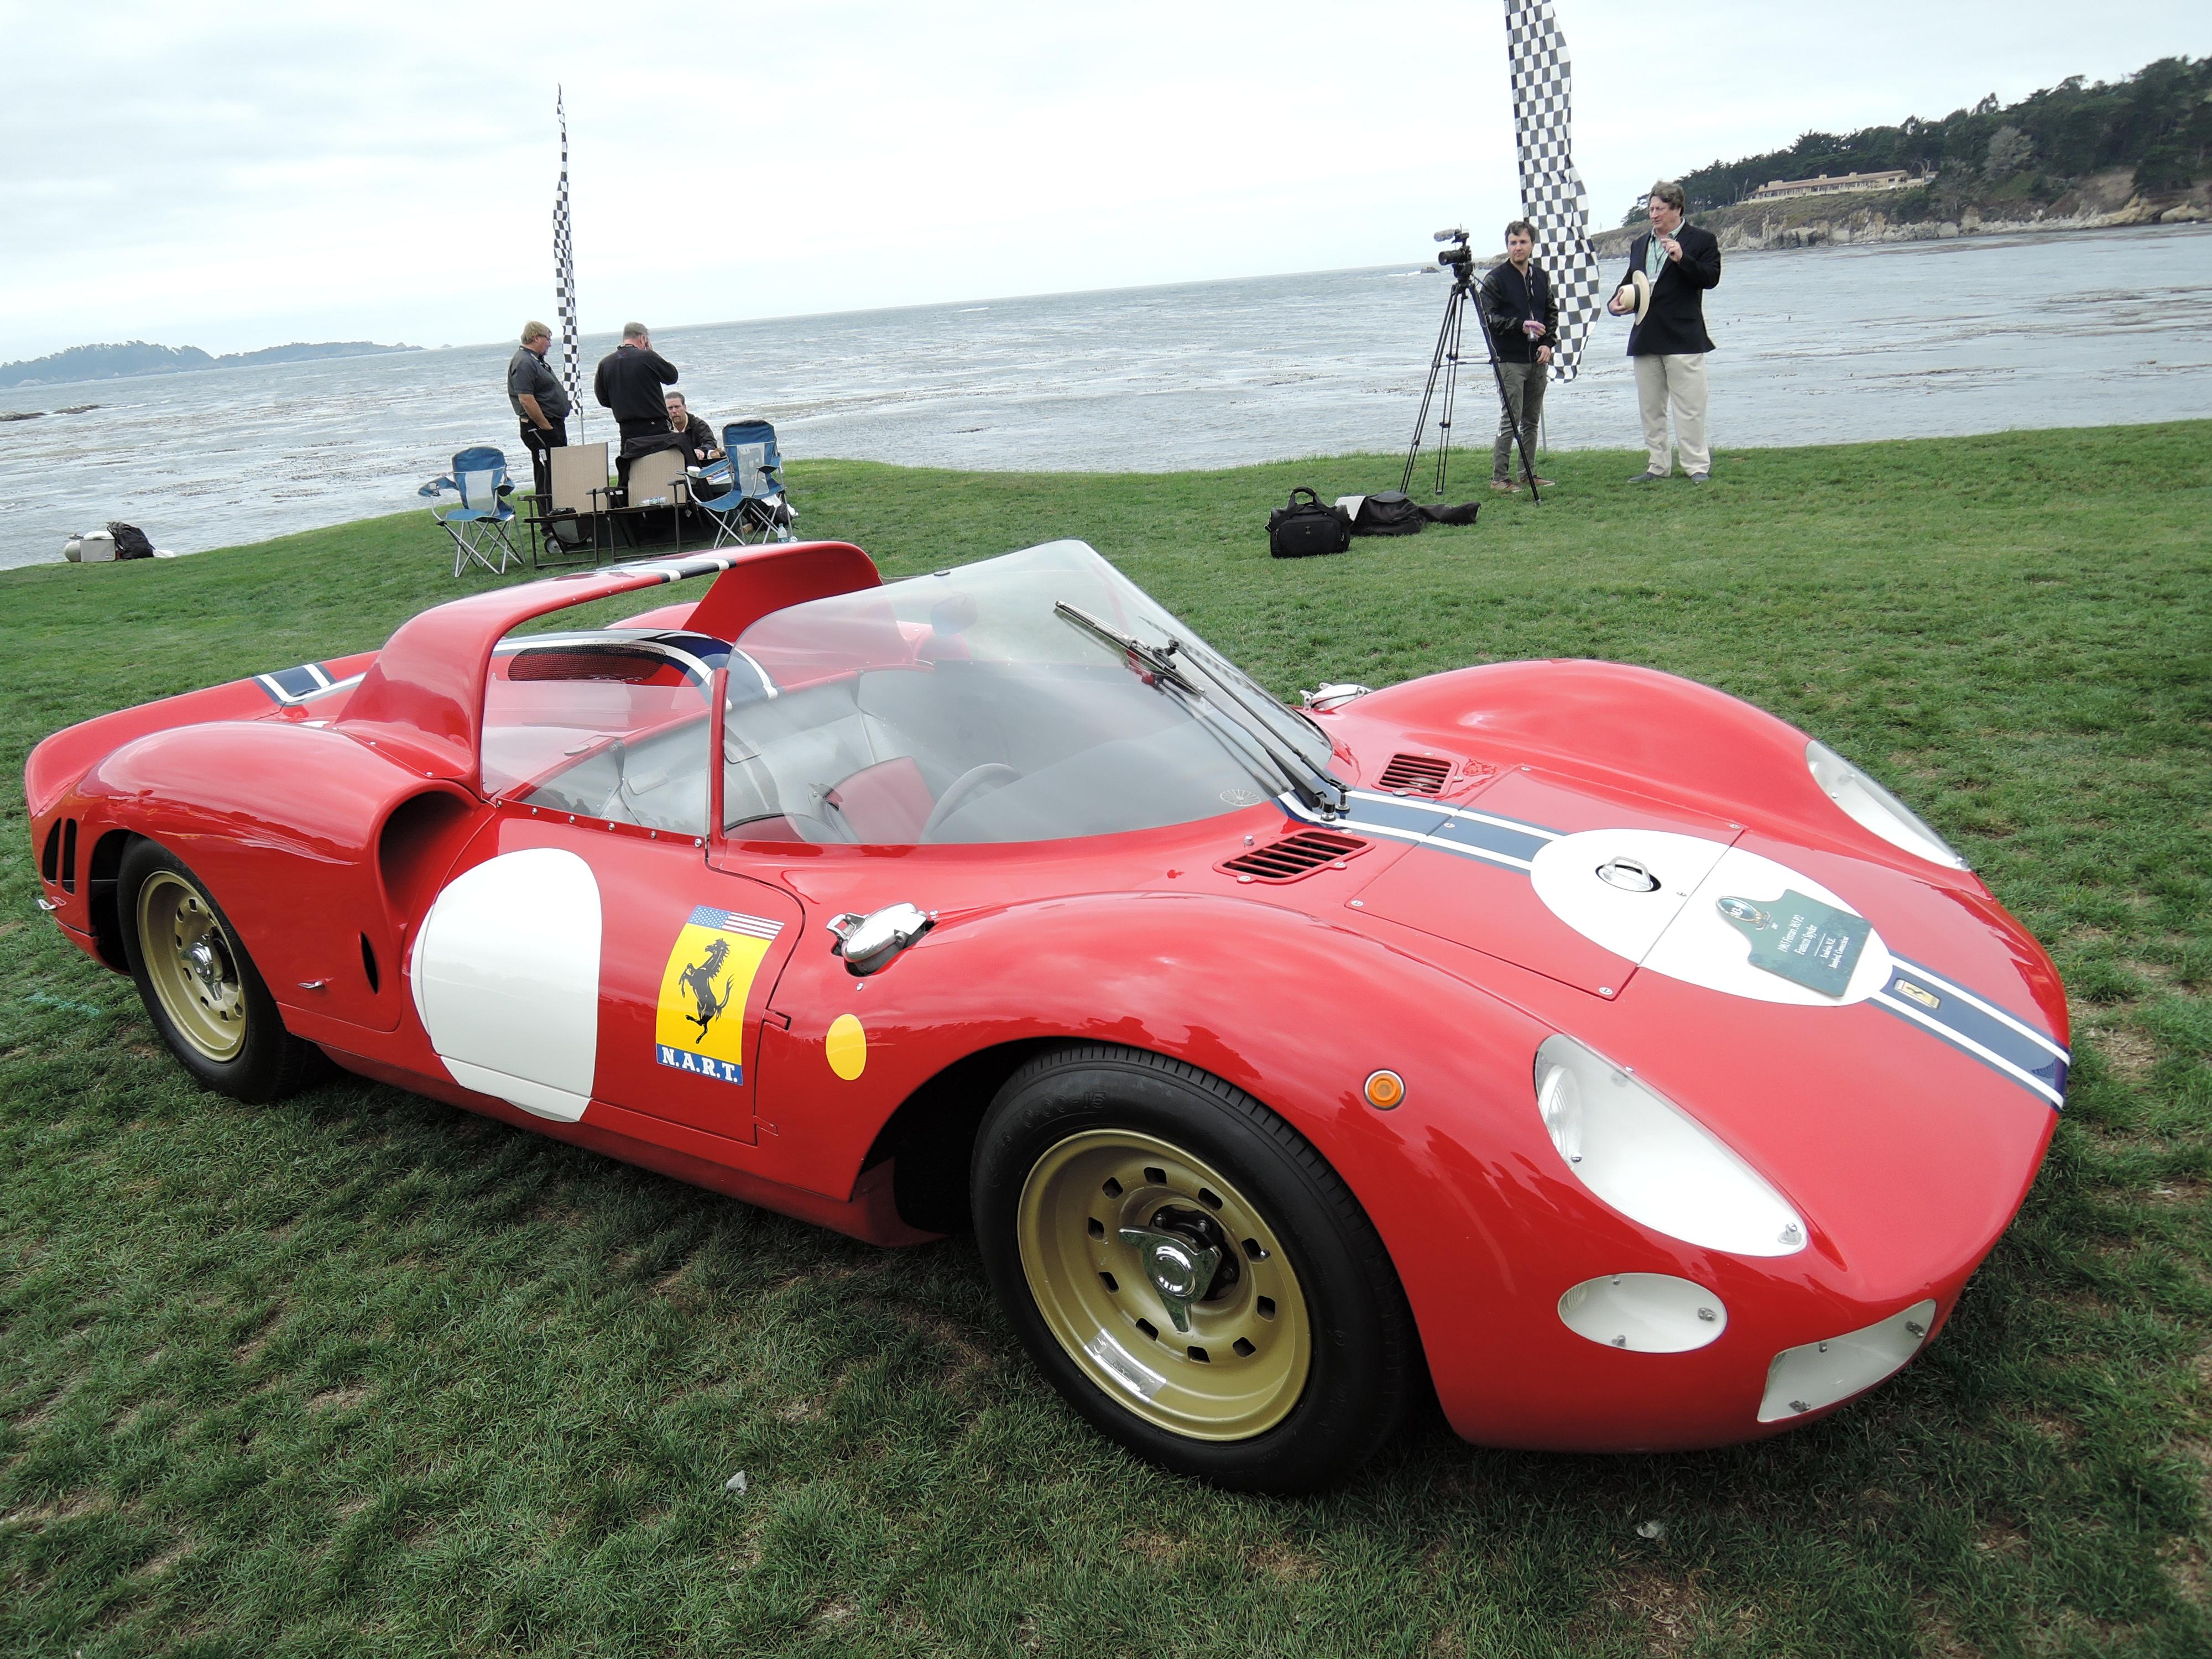 red 1965 Ferrari 365 P2 Fantuzzi Spyder; Sn 0838 - Pebble Beach Concours d'Elegance 2017